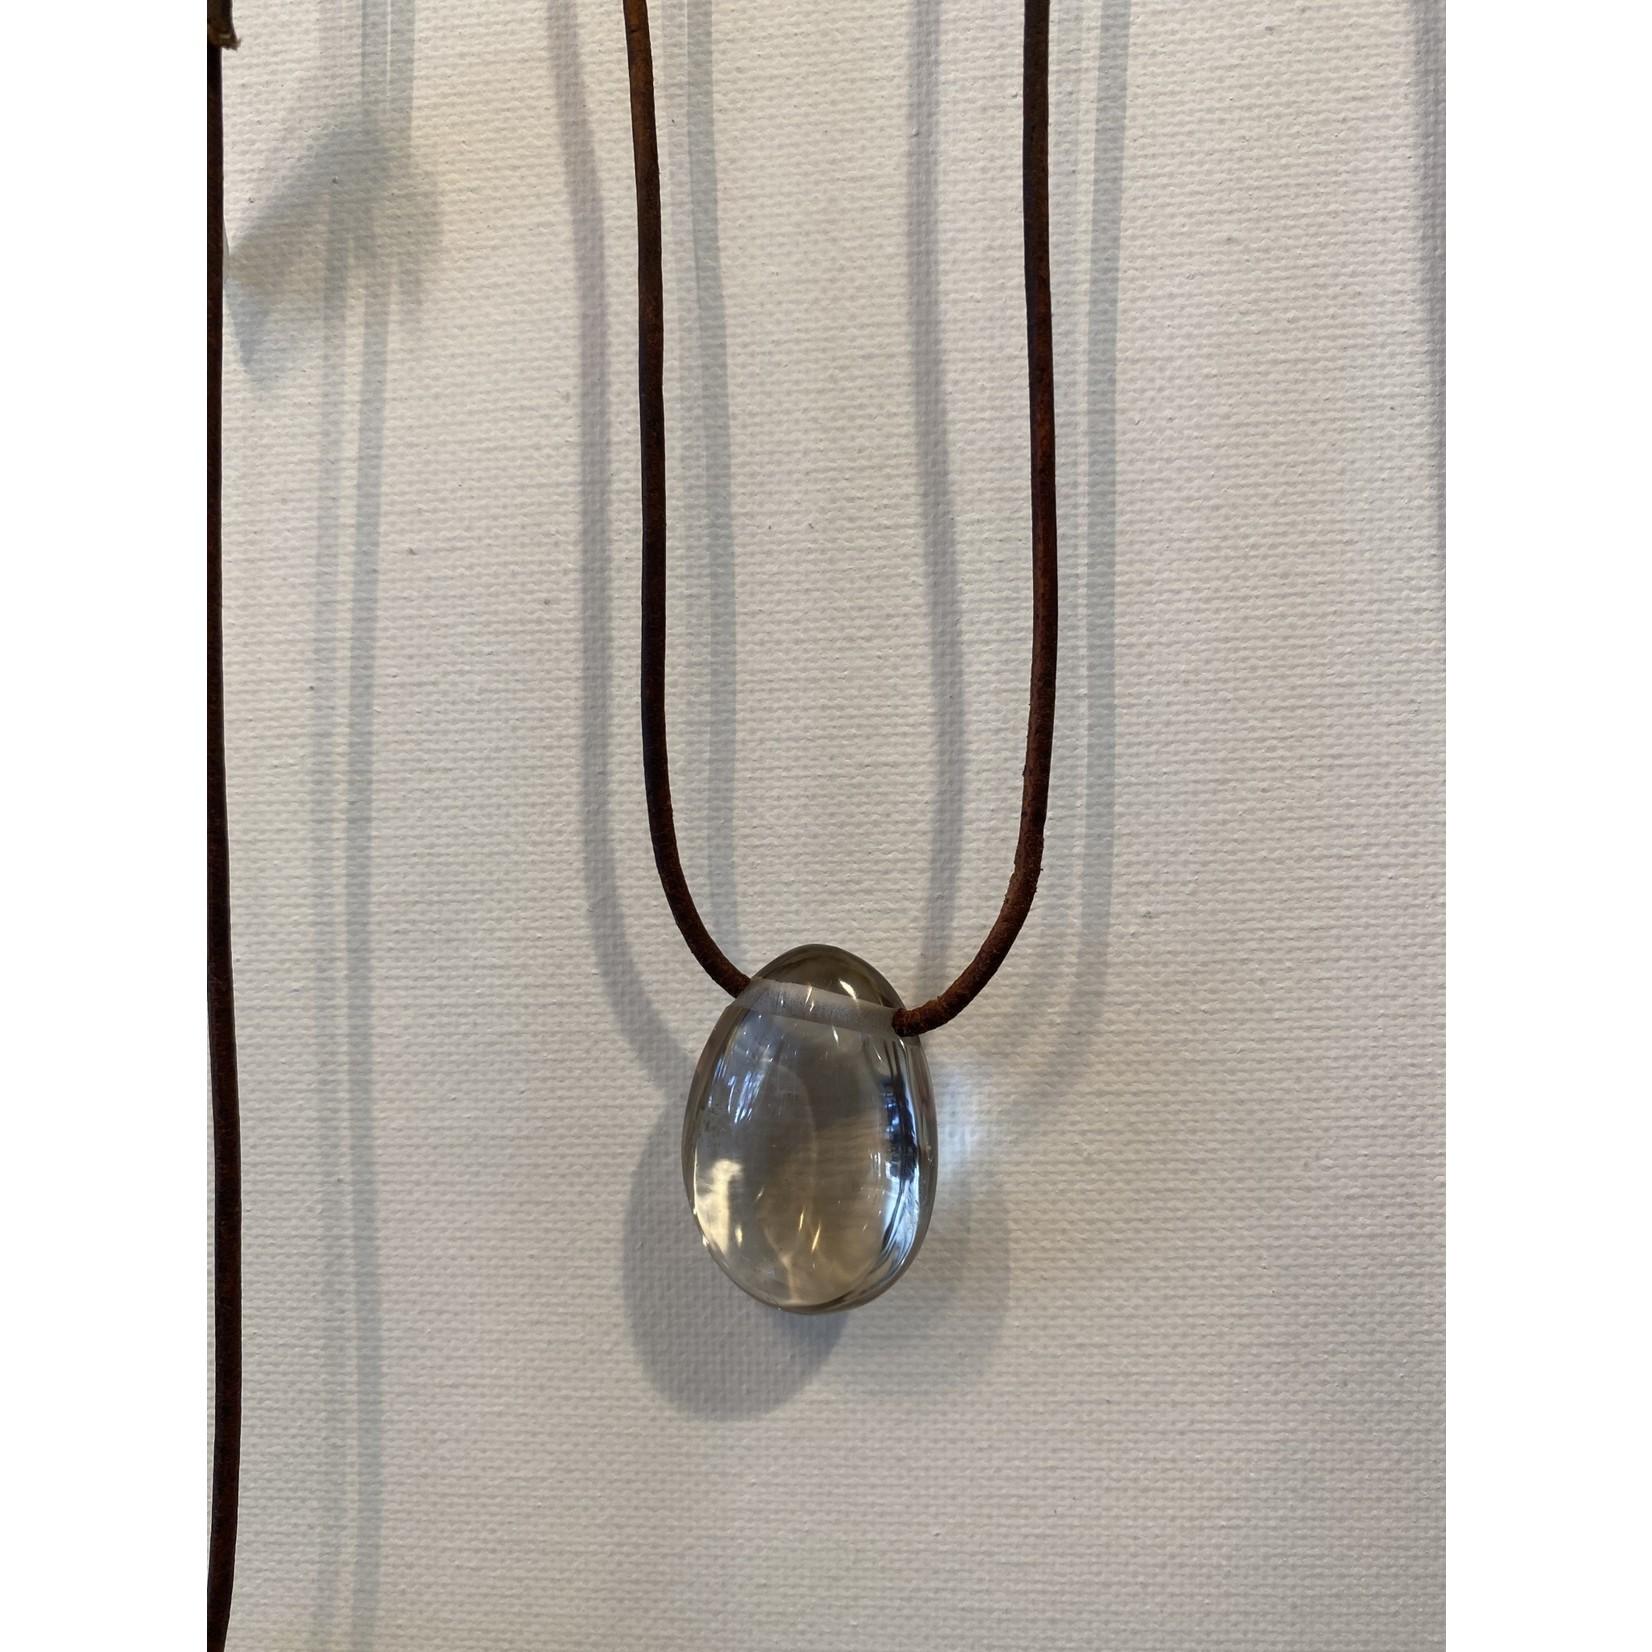 Smokey Quartz Necklace on leather cord